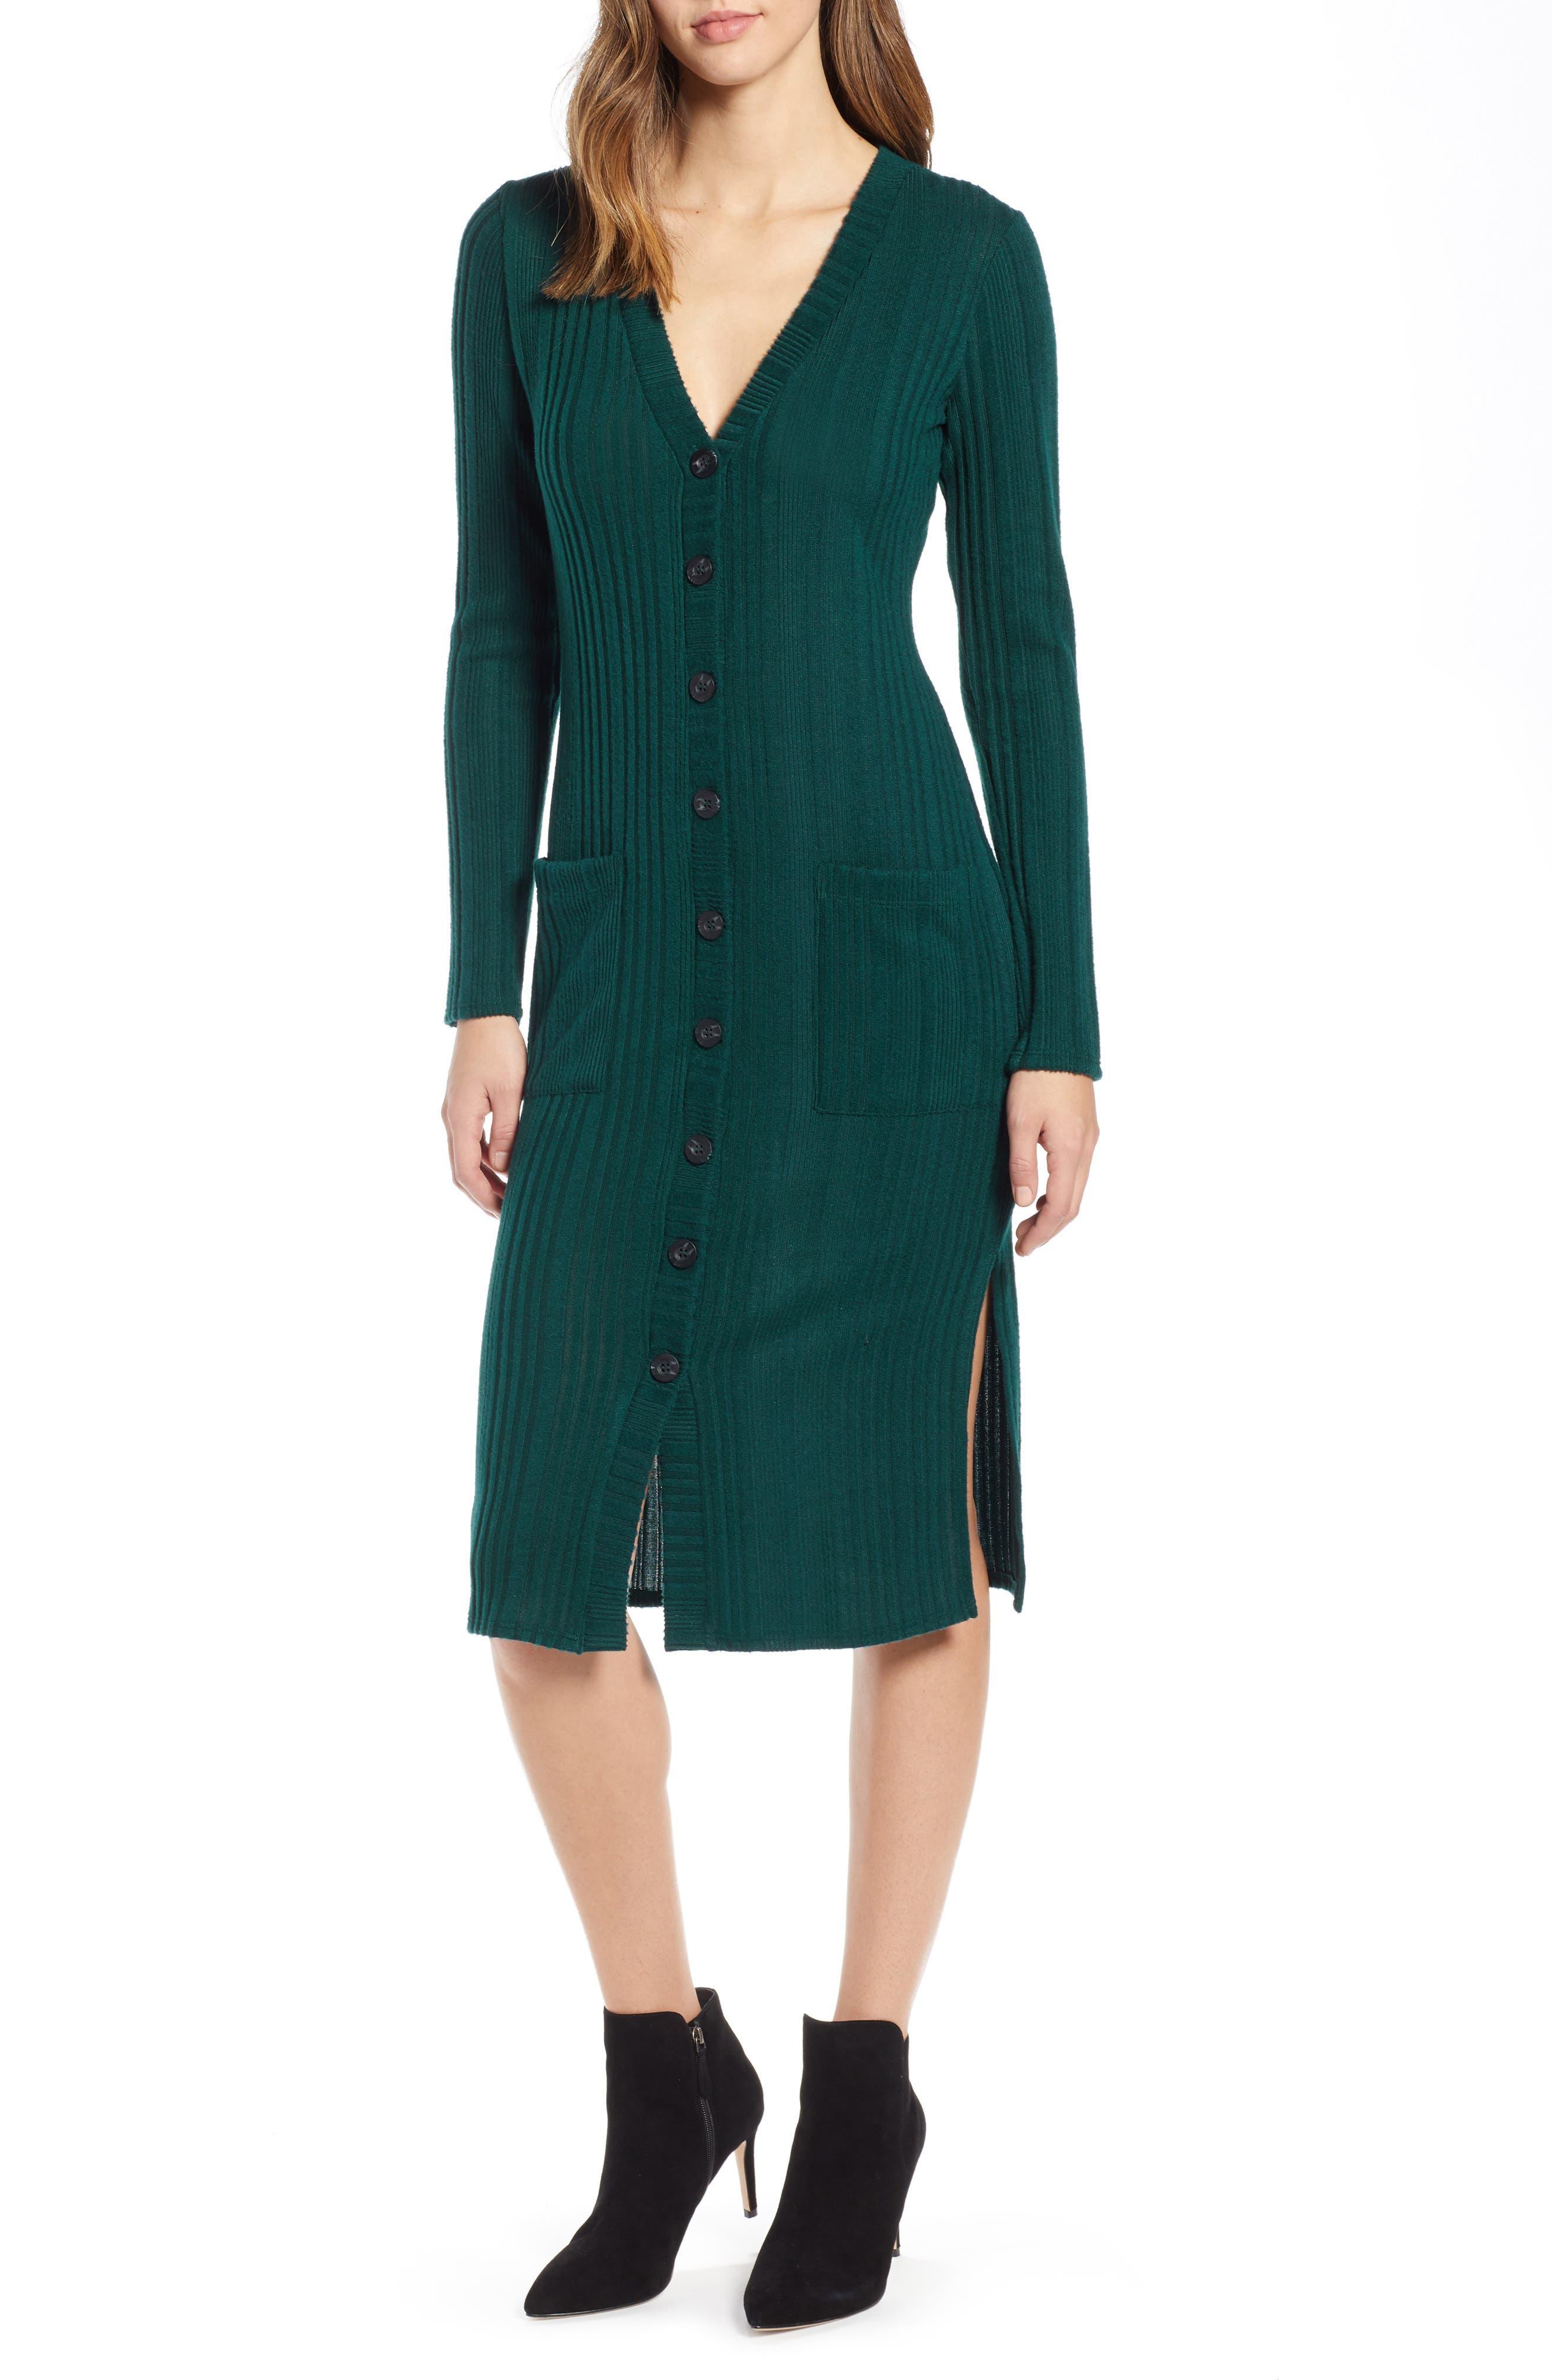 SOCIALITE Sweater Dress, Main, color, 300